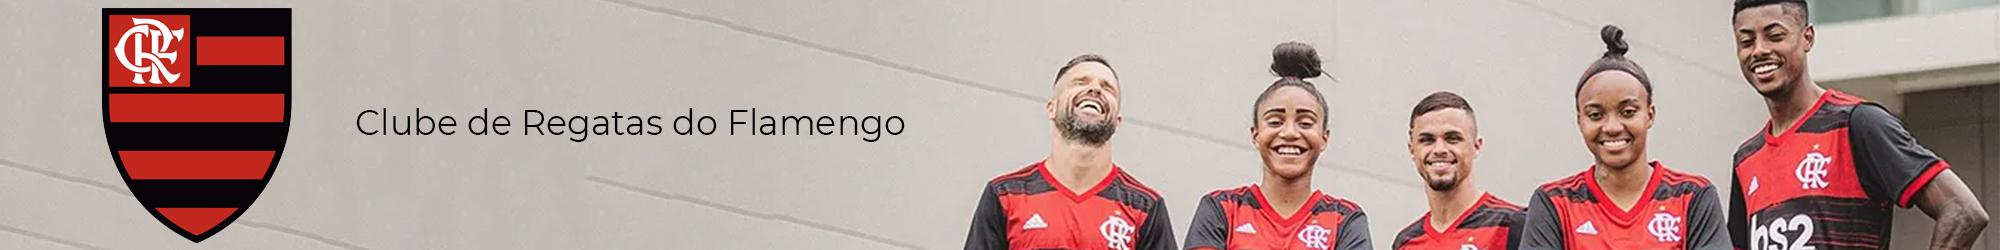 loja-do-flamengo-adidas-n10-sports